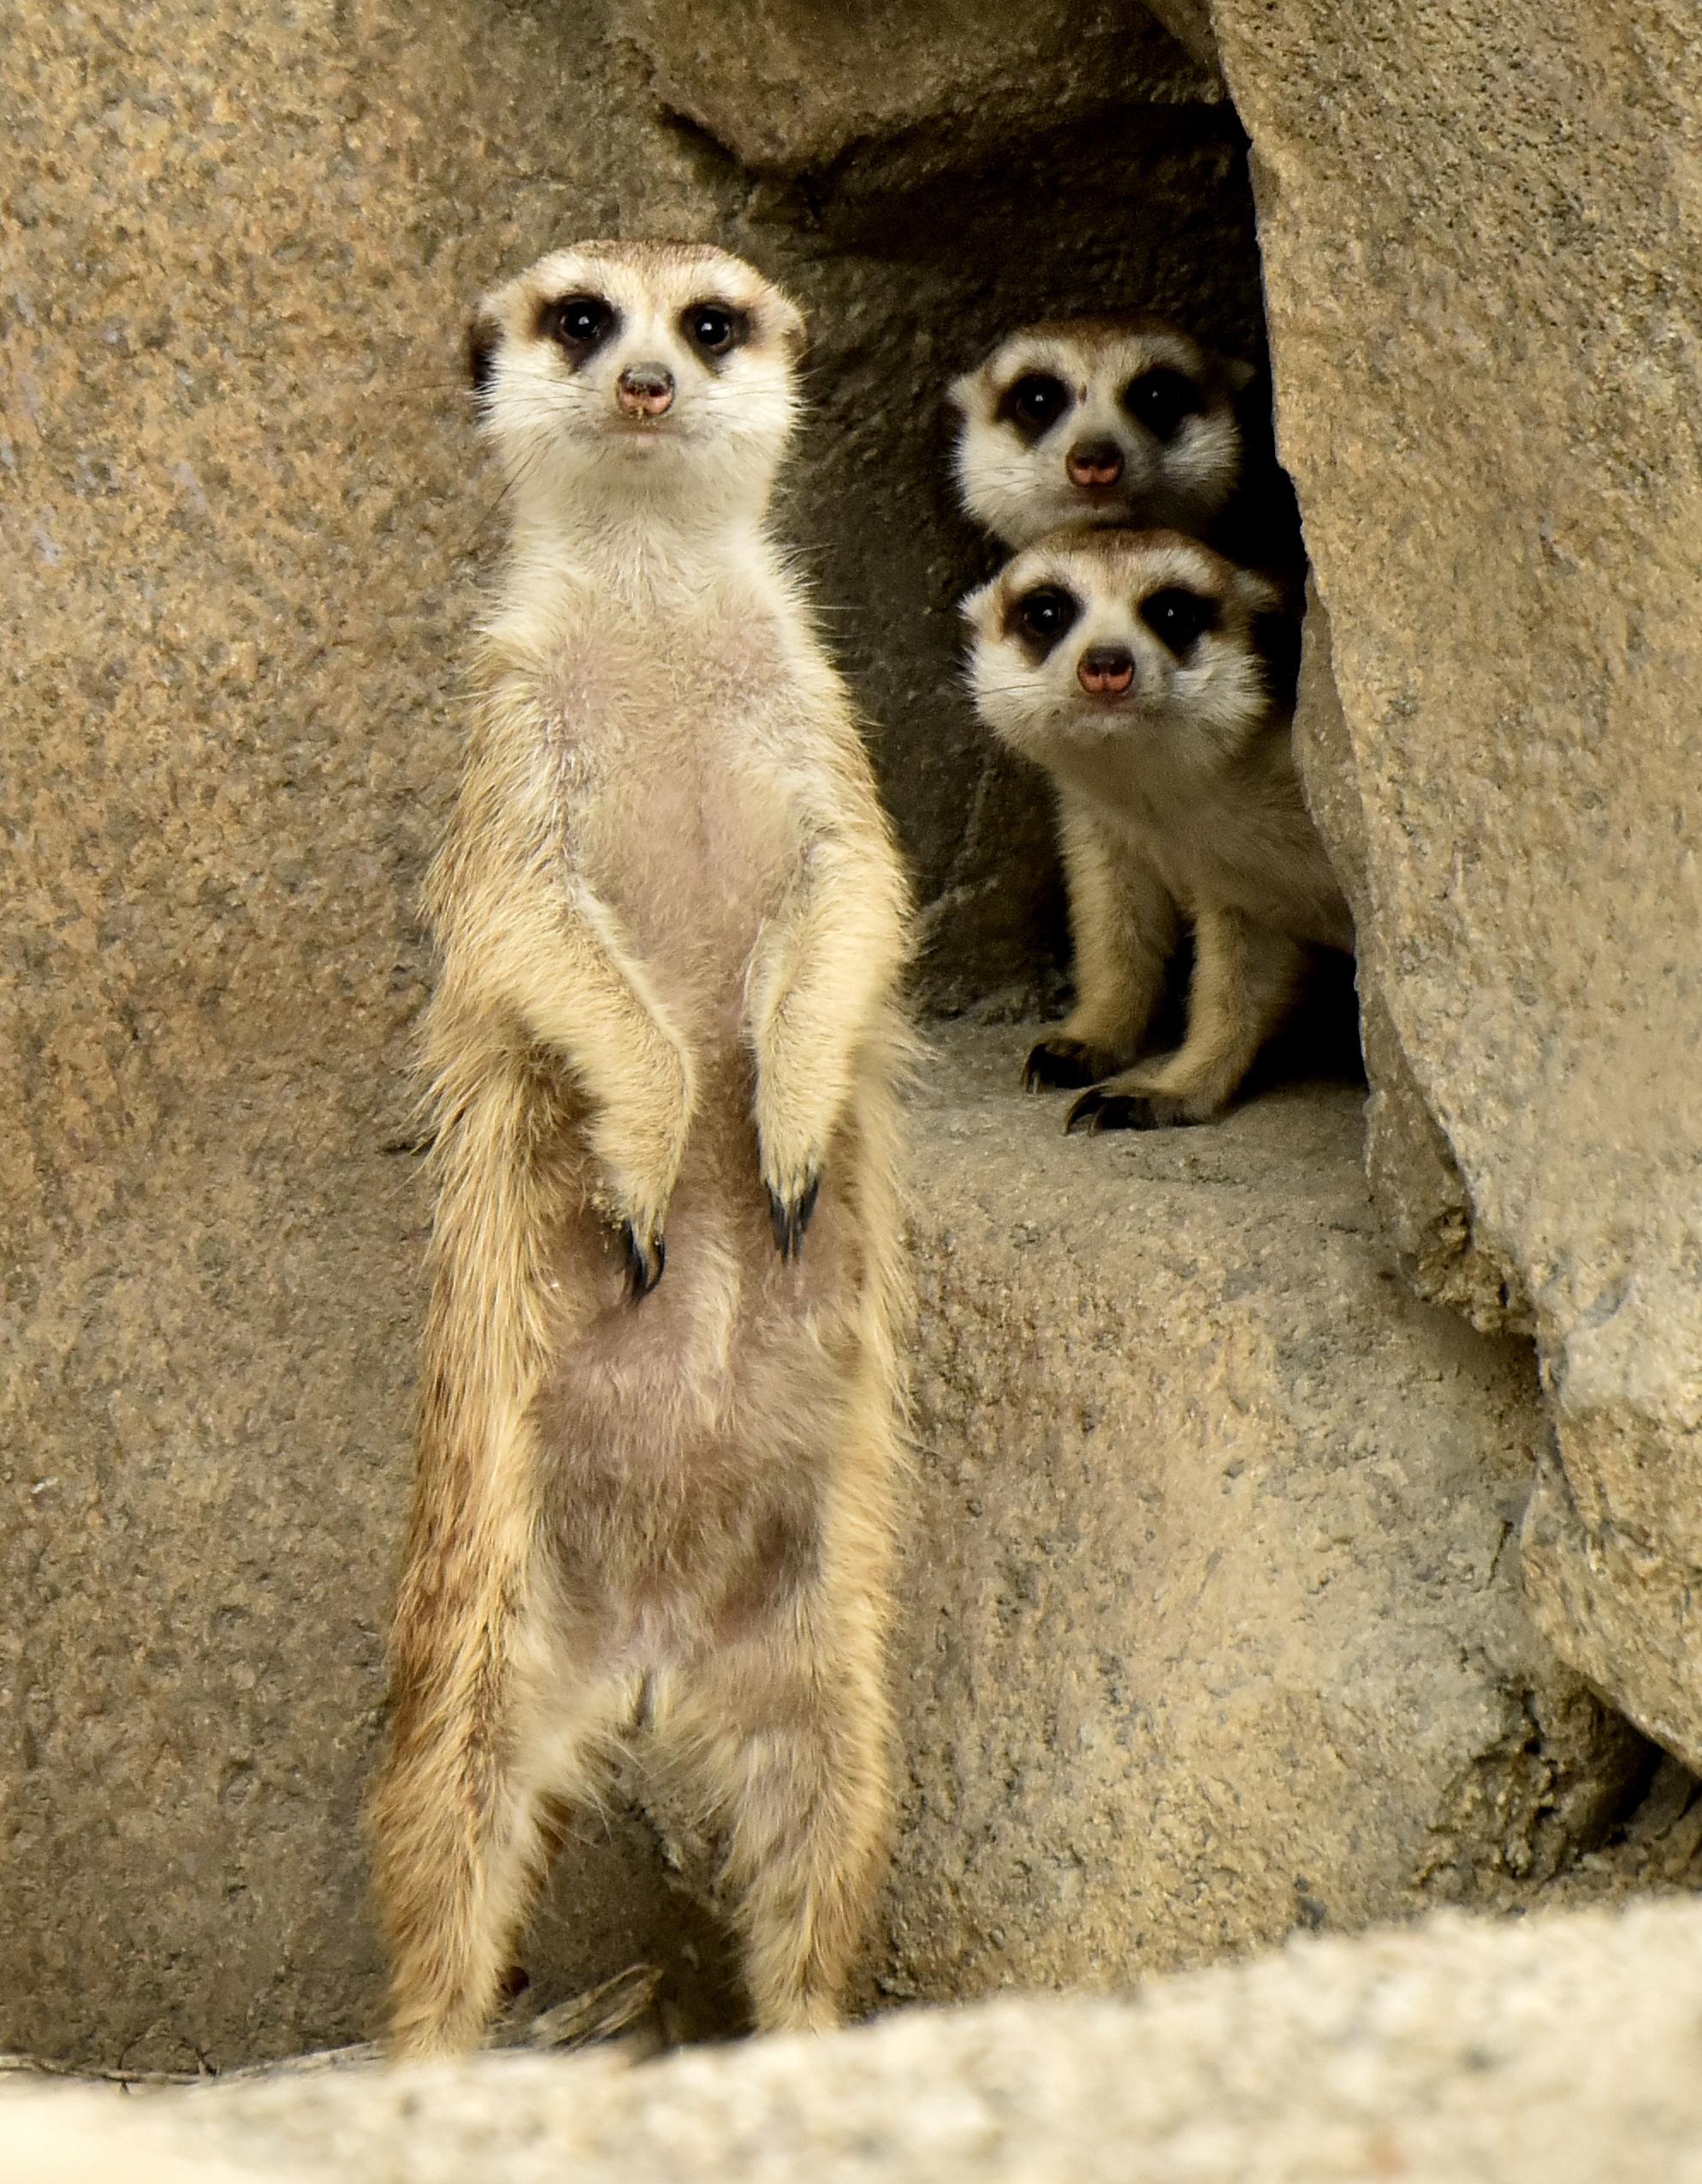 2015-05-04 Zoo Meerkats Lions Gladys Harambe 3 641